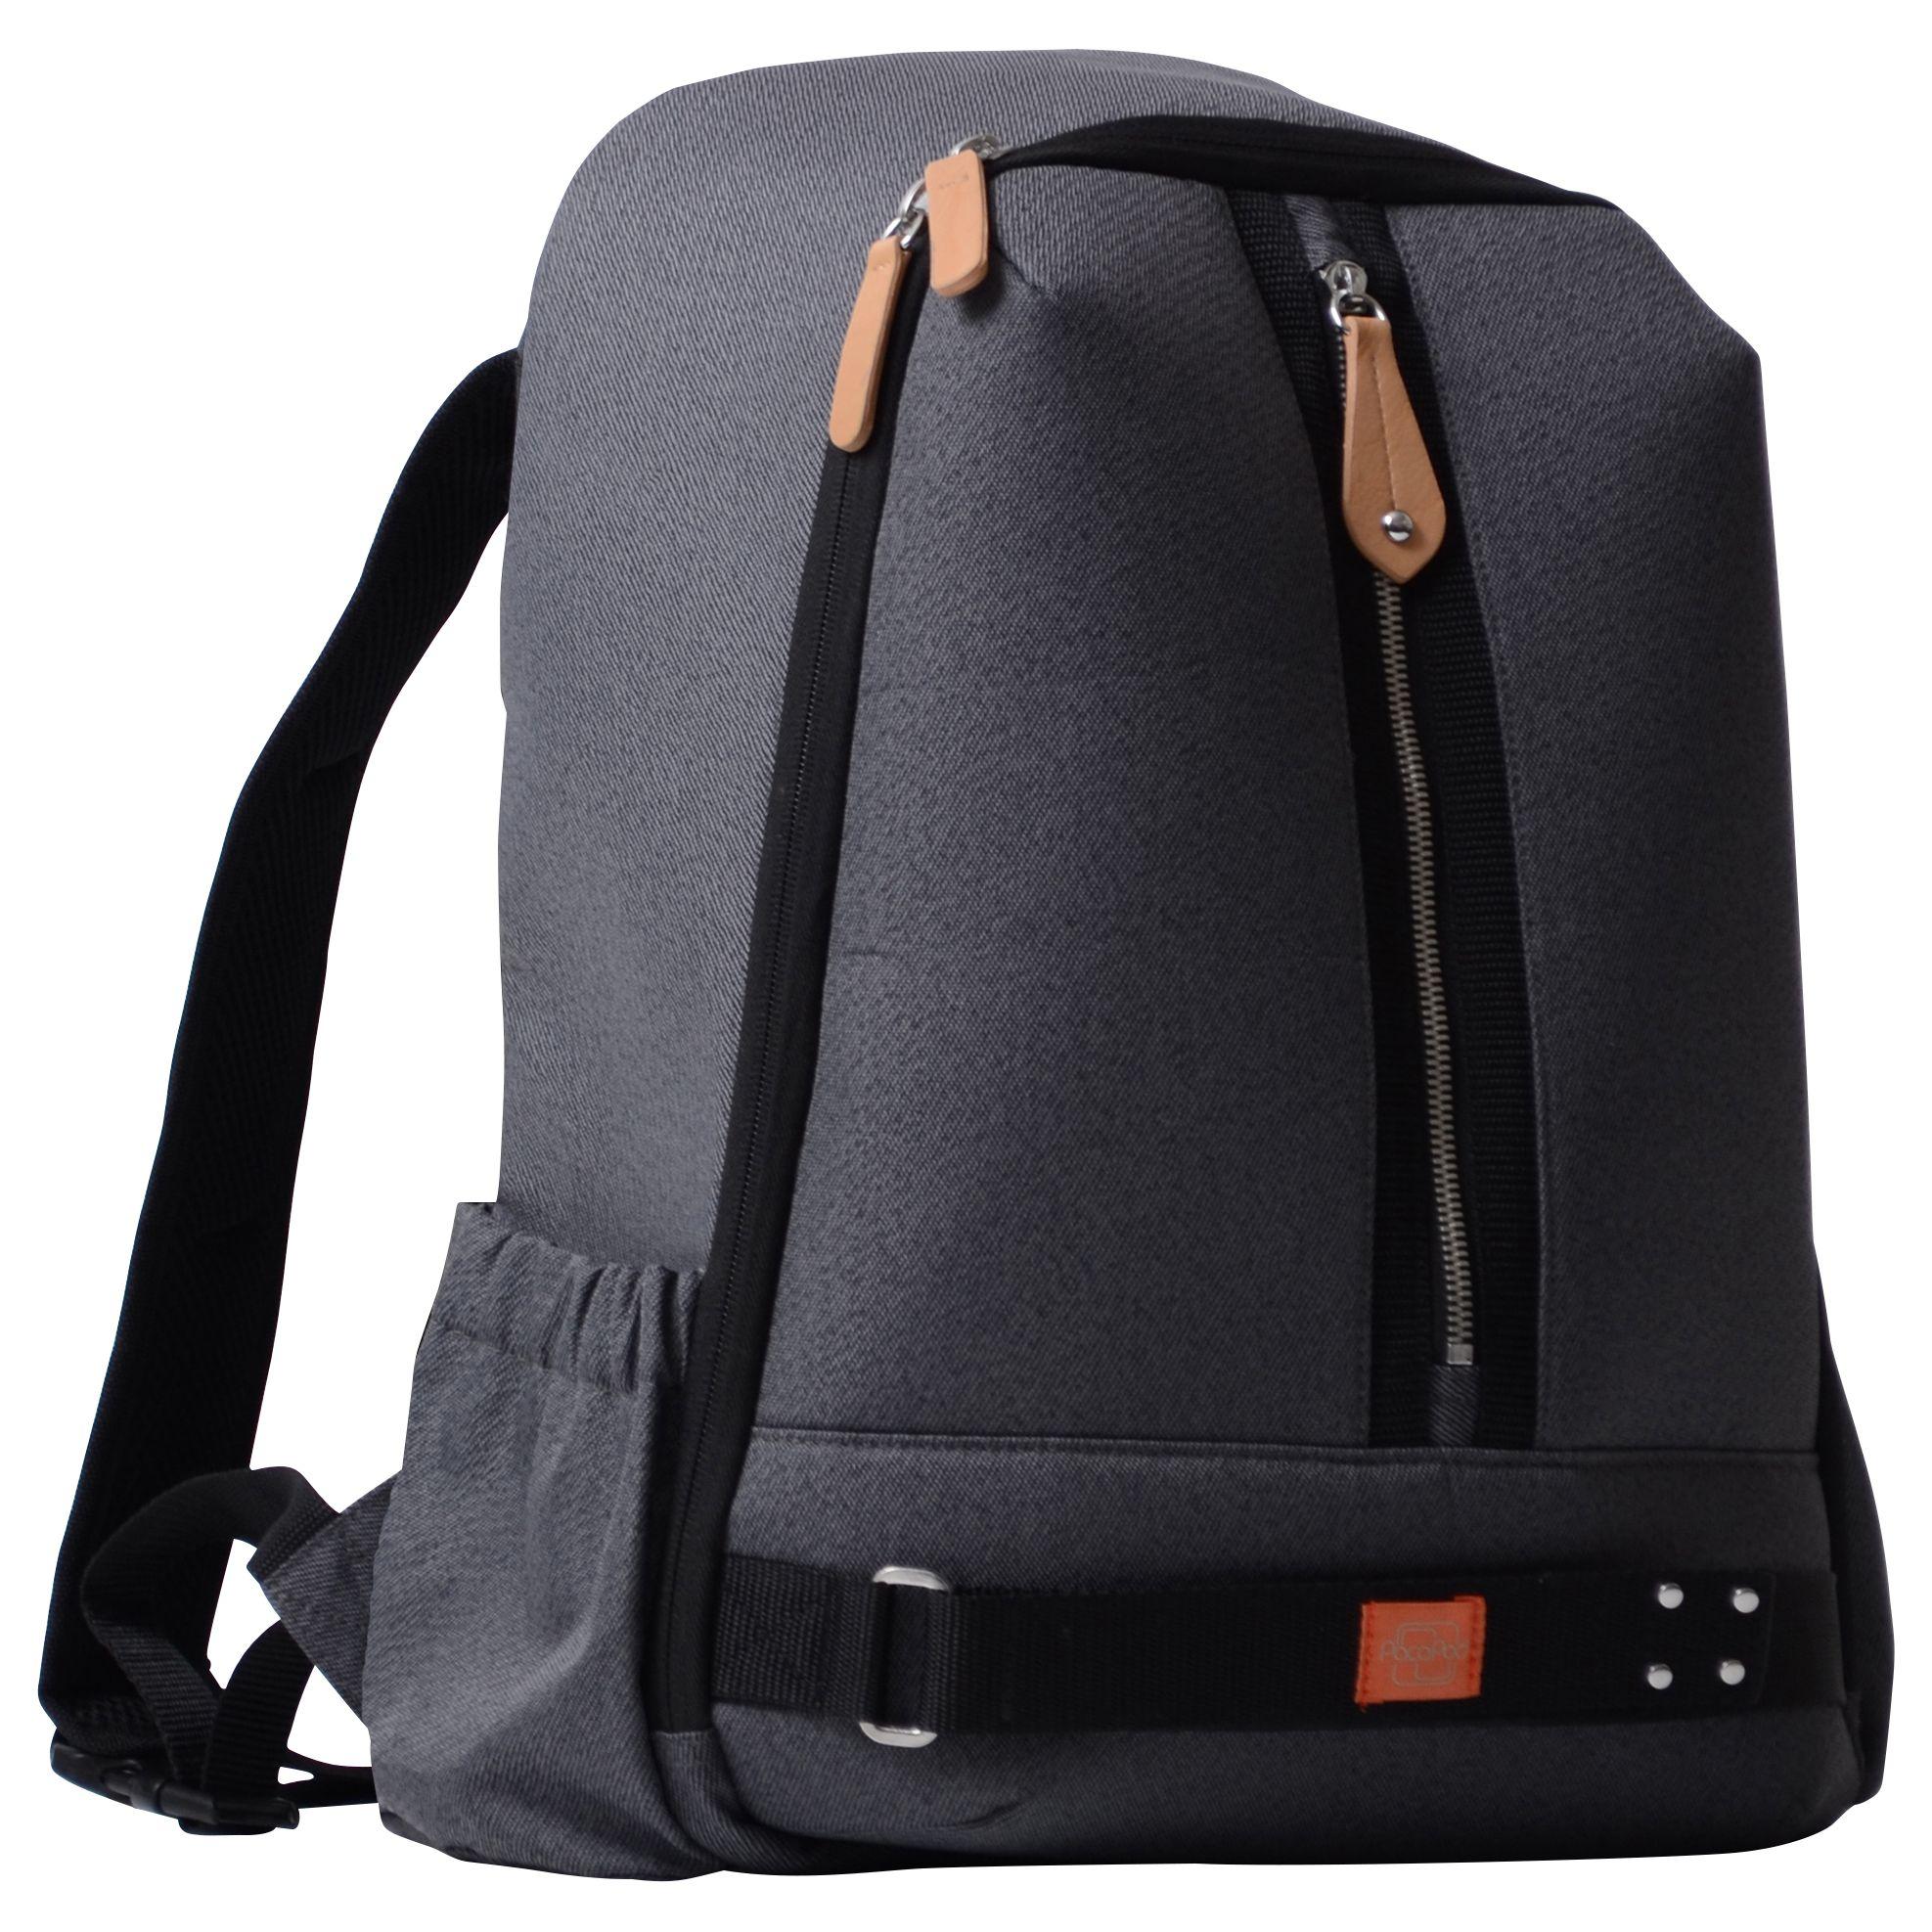 PacaPod PacaPod Picos Pack Changing Bag, Black Charcoal